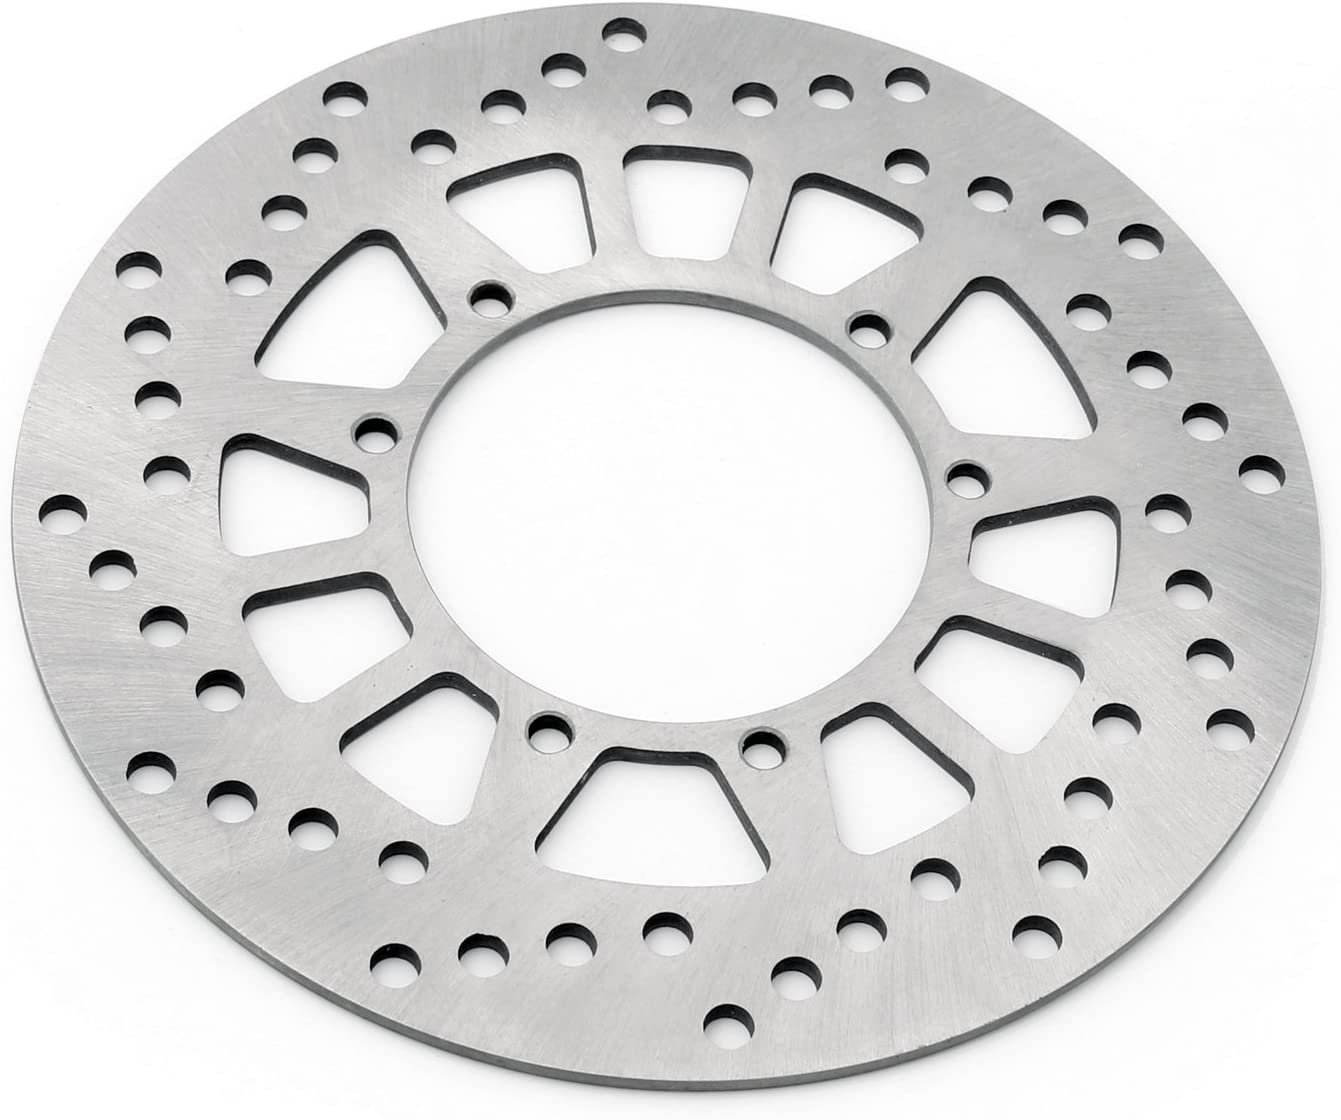 Topteng Front Brake Disc Rotor for Yama-ha TW 125 99-04 200 2JL//4CS1//2//3//5 91-98 5EK//5RS